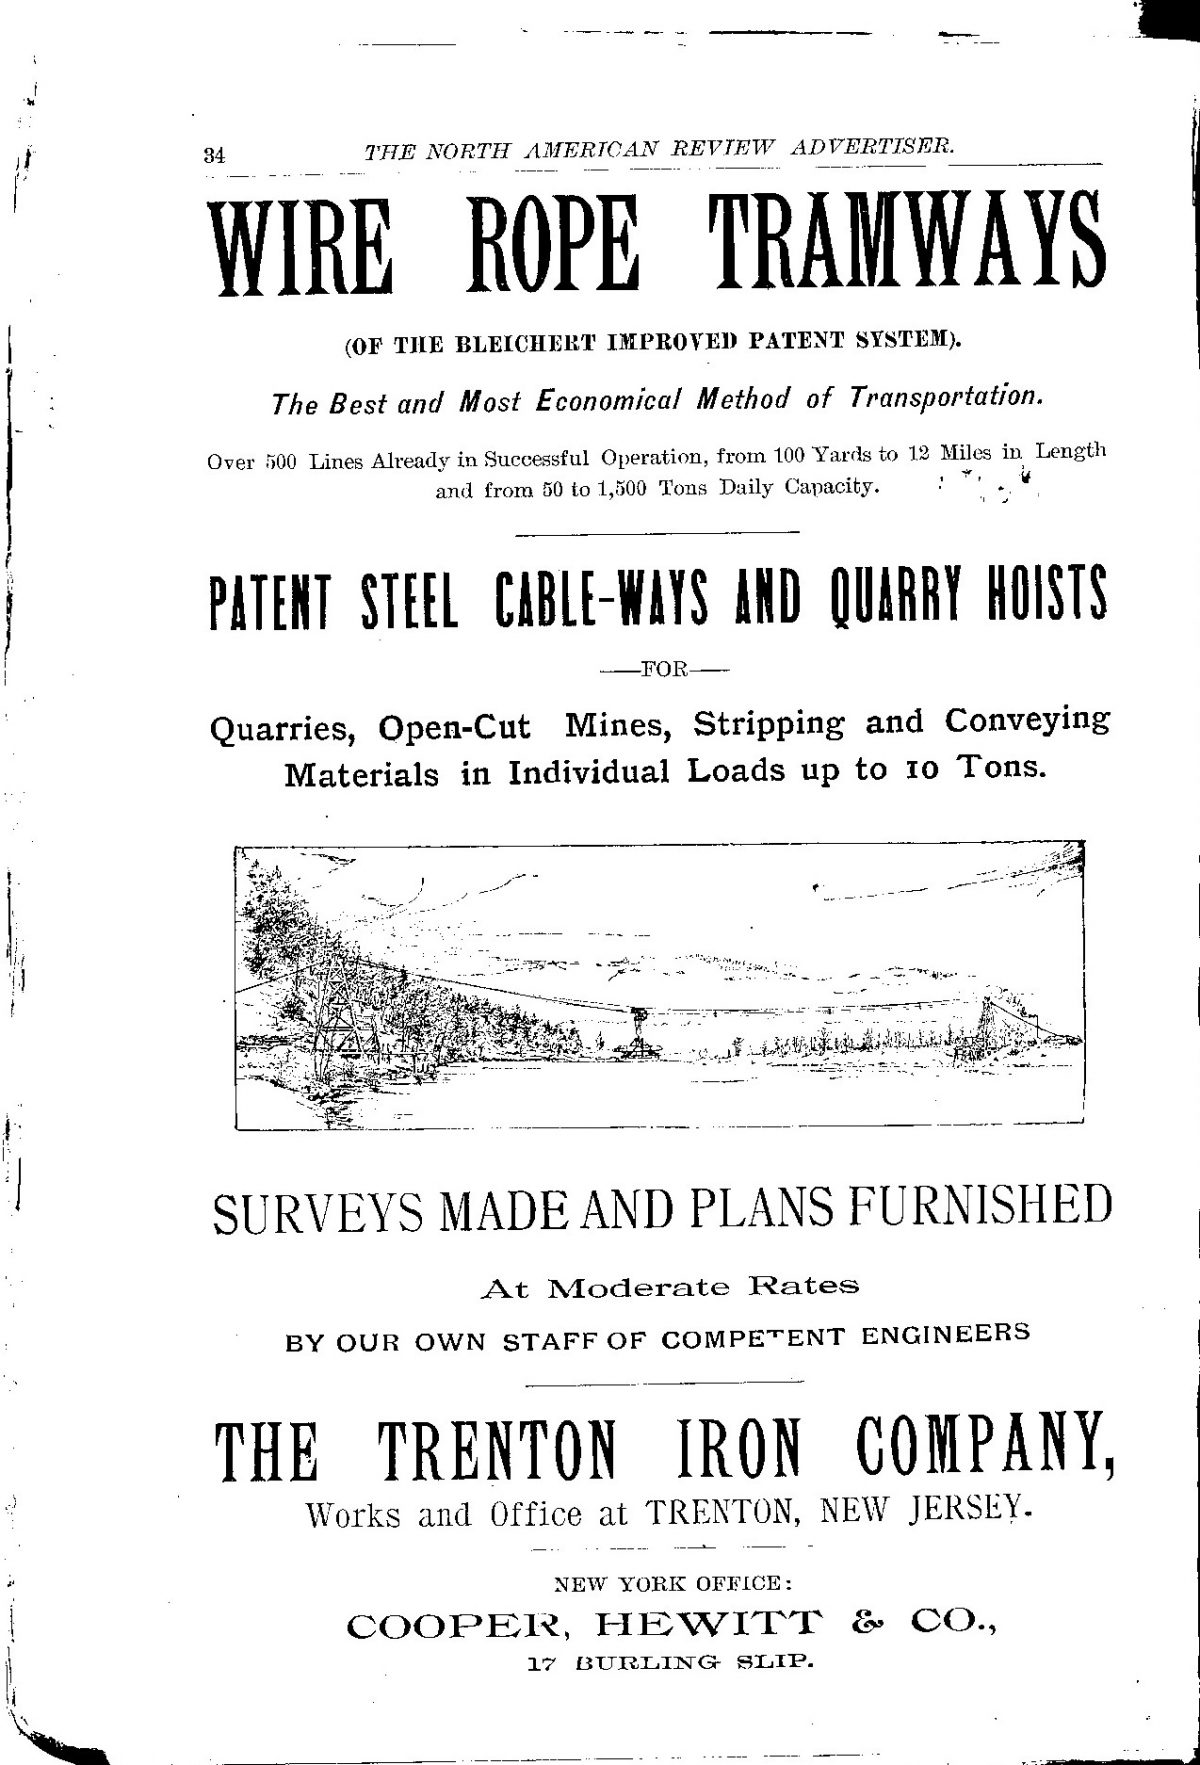 Trenton Iron / American Wire & Steel / U.S. Steel - Bleichert & Co.